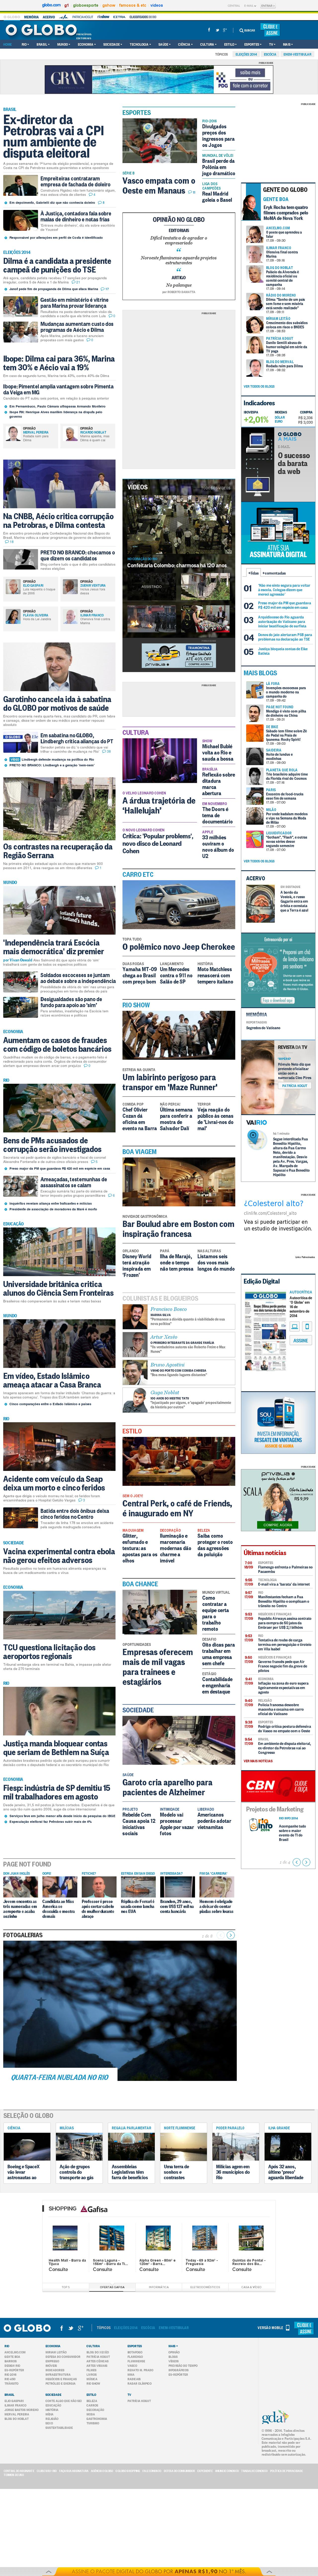 O Globo at Wednesday Sept. 17, 2014, 1:07 p.m. UTC